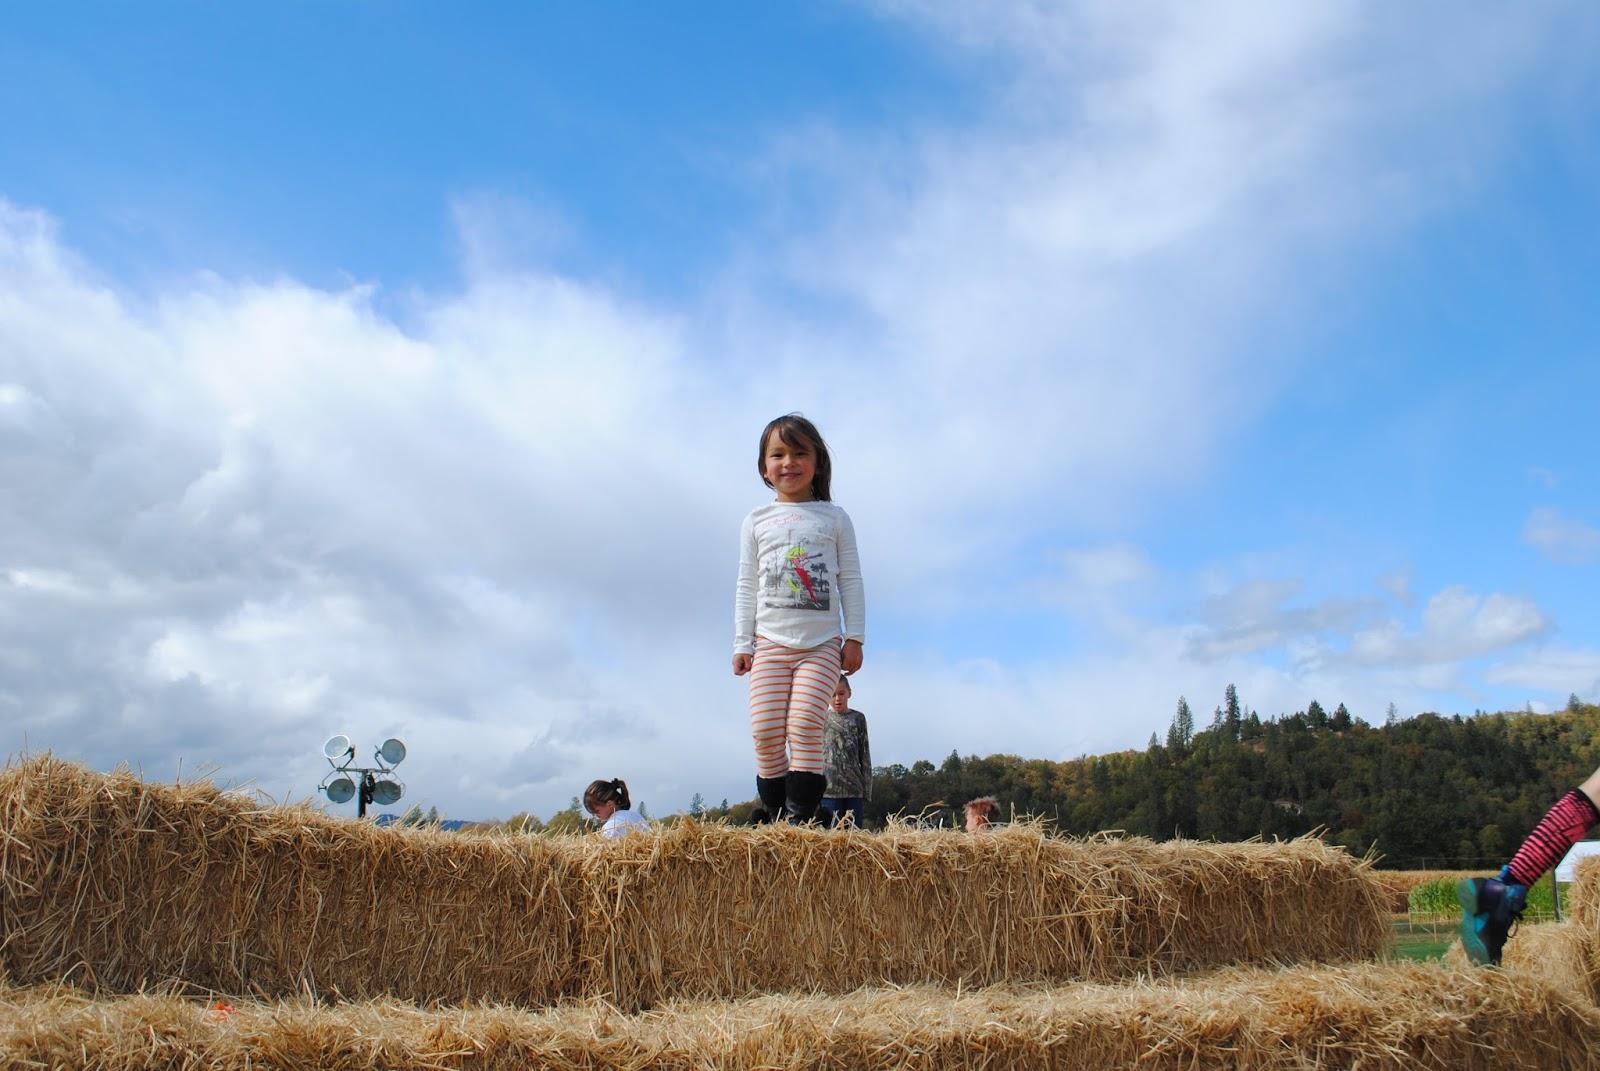 Fort Vannoy Farms Harvest Festival - Grants Pass, Oregon - Josephine County - Rogue Valley - Southern Oregon - Fall - Autumn - Pumpkin Patch - Corn Maze - Hayrides